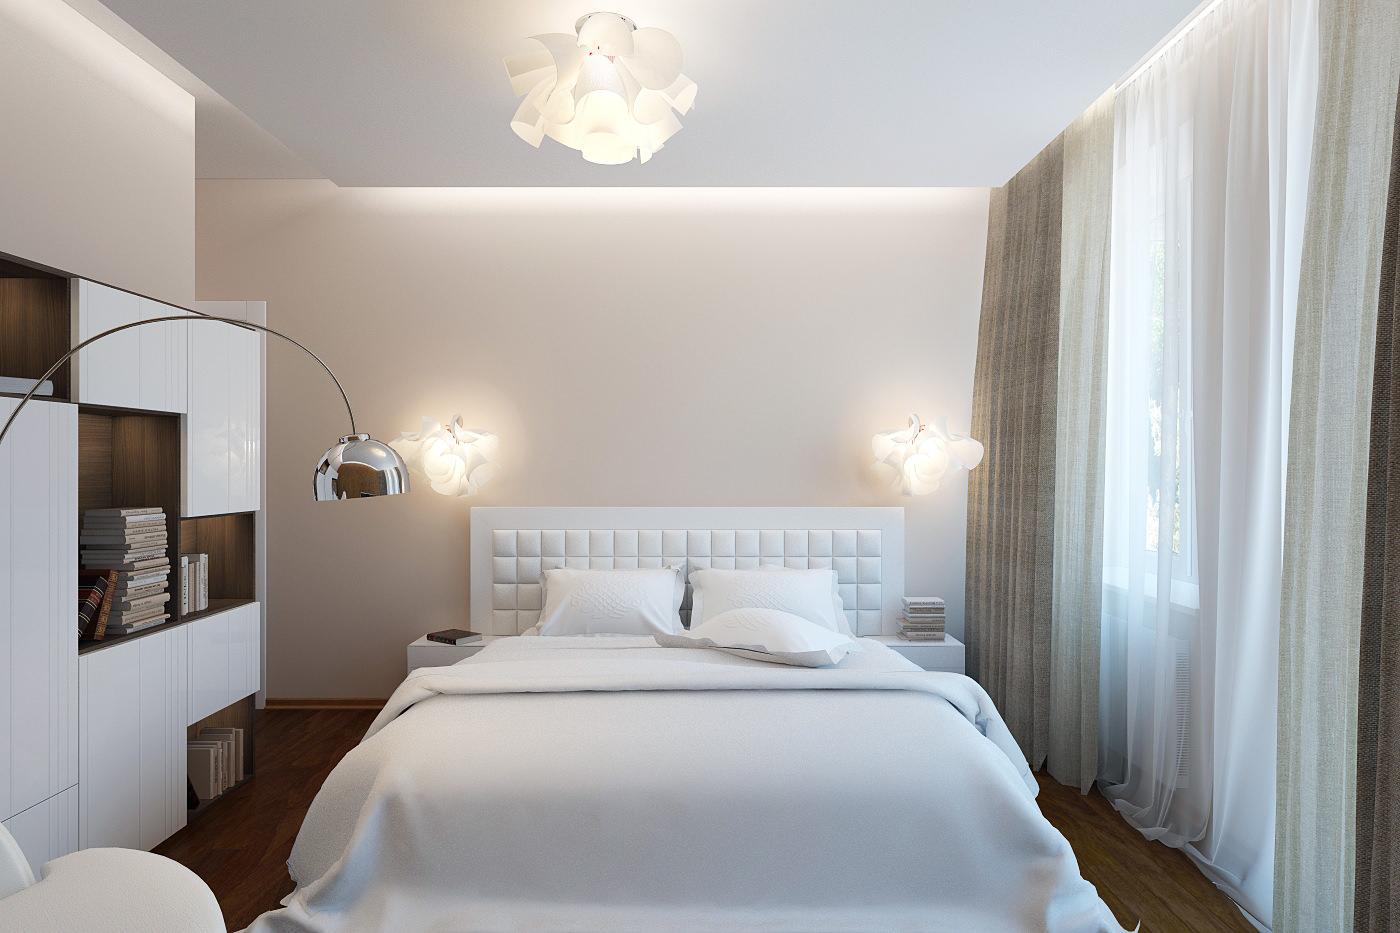 savremenen-interioren-proekt-za-dvustaen-apartament-60-m-5g